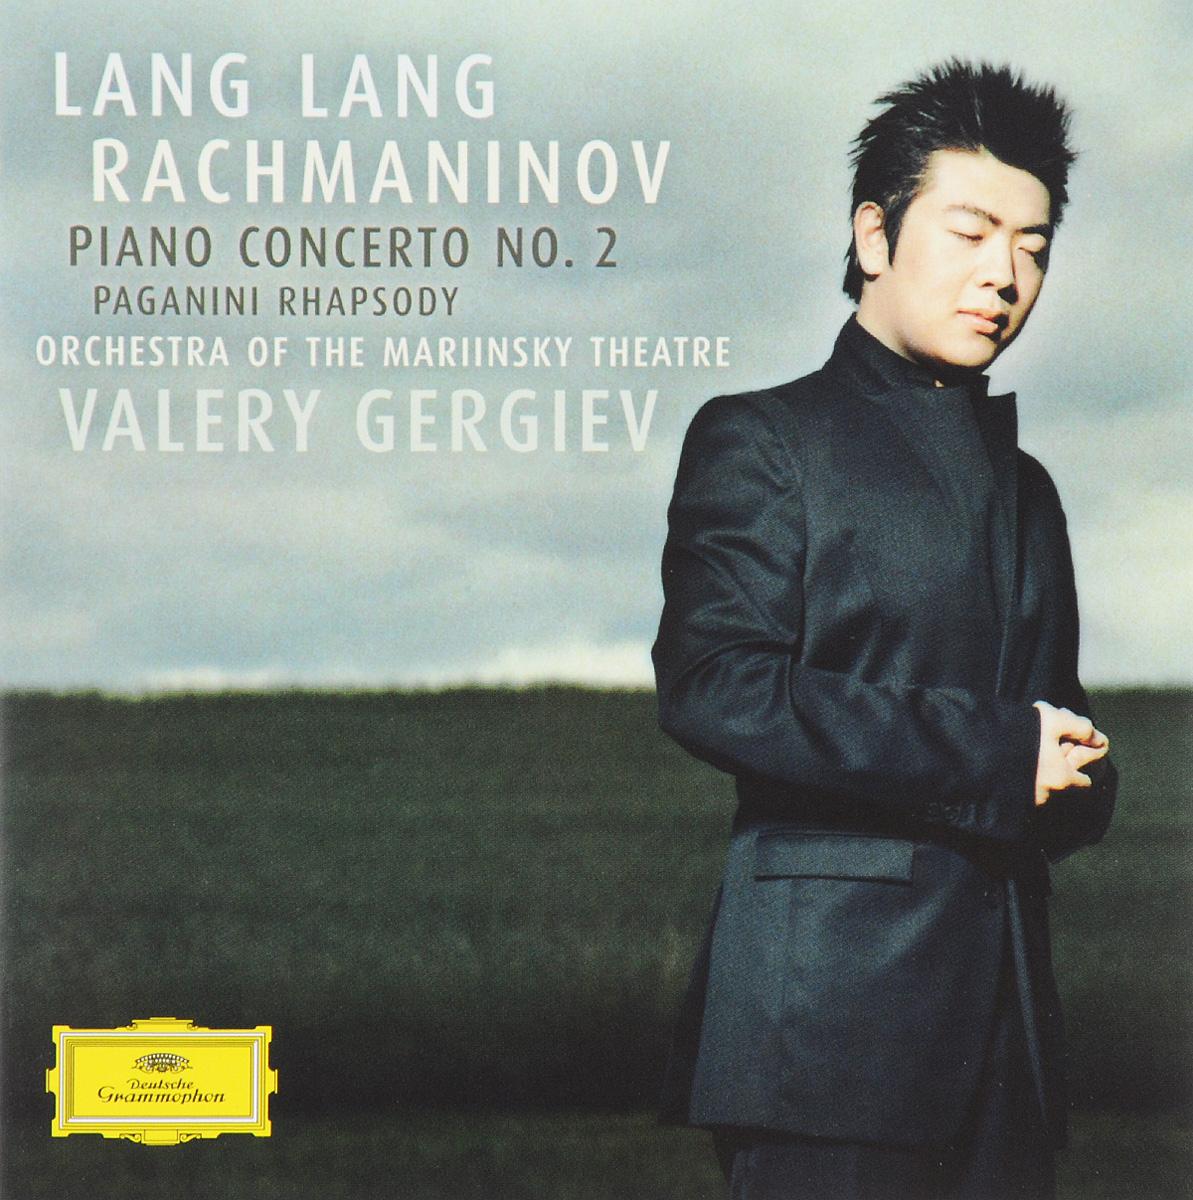 Валерий Гергиев,Ланг Ланг,Orchestra Of The Mariinsky Theatre Valery Gergiev, Lang Lang. Rachmaninov. Piano Concerto No. 2 / Paganini Rhapsody